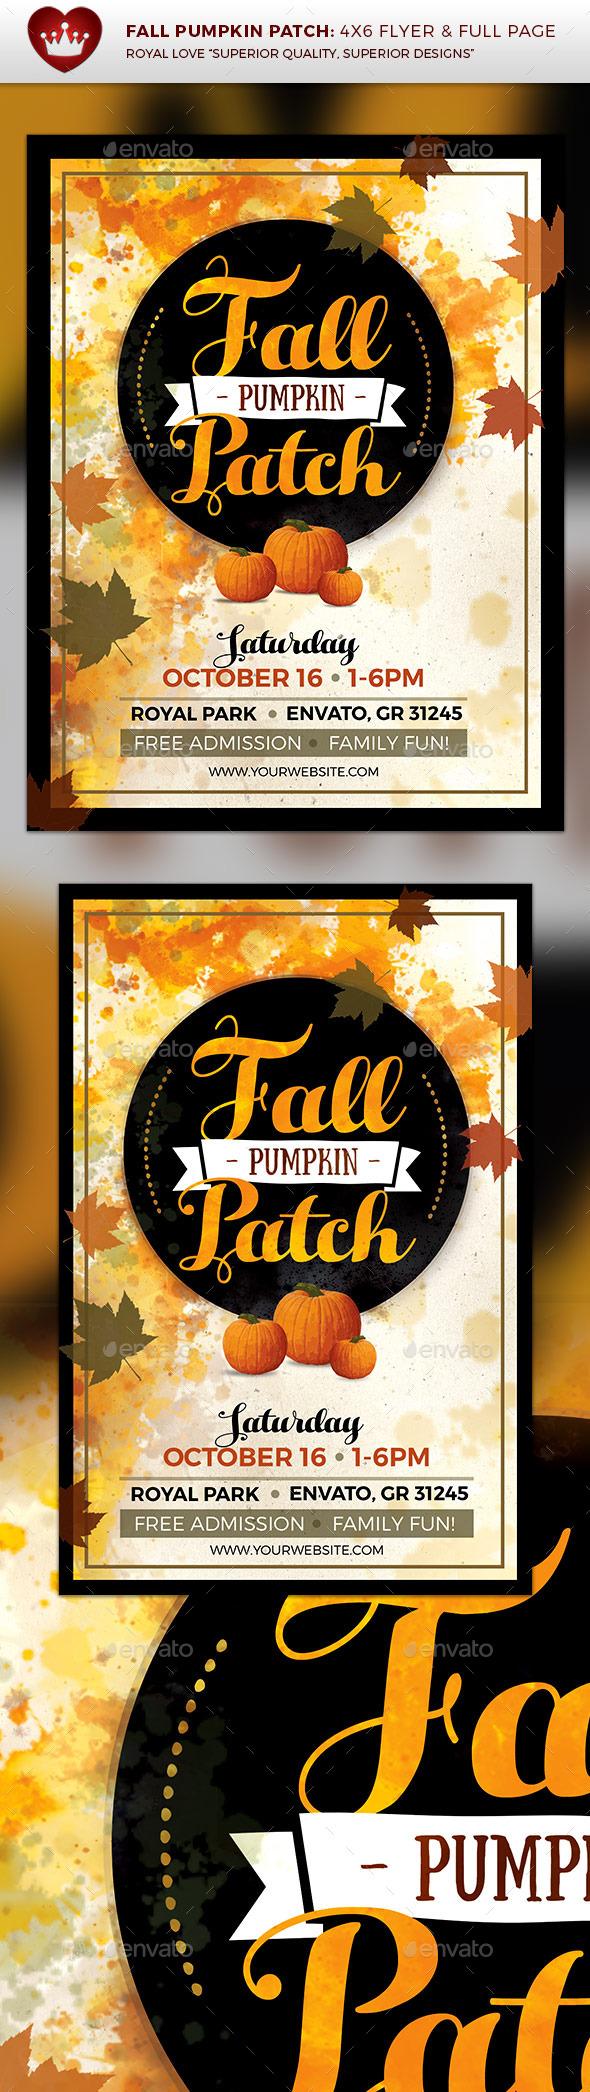 Fall Pumpkin Patch Flyer - Events Flyers